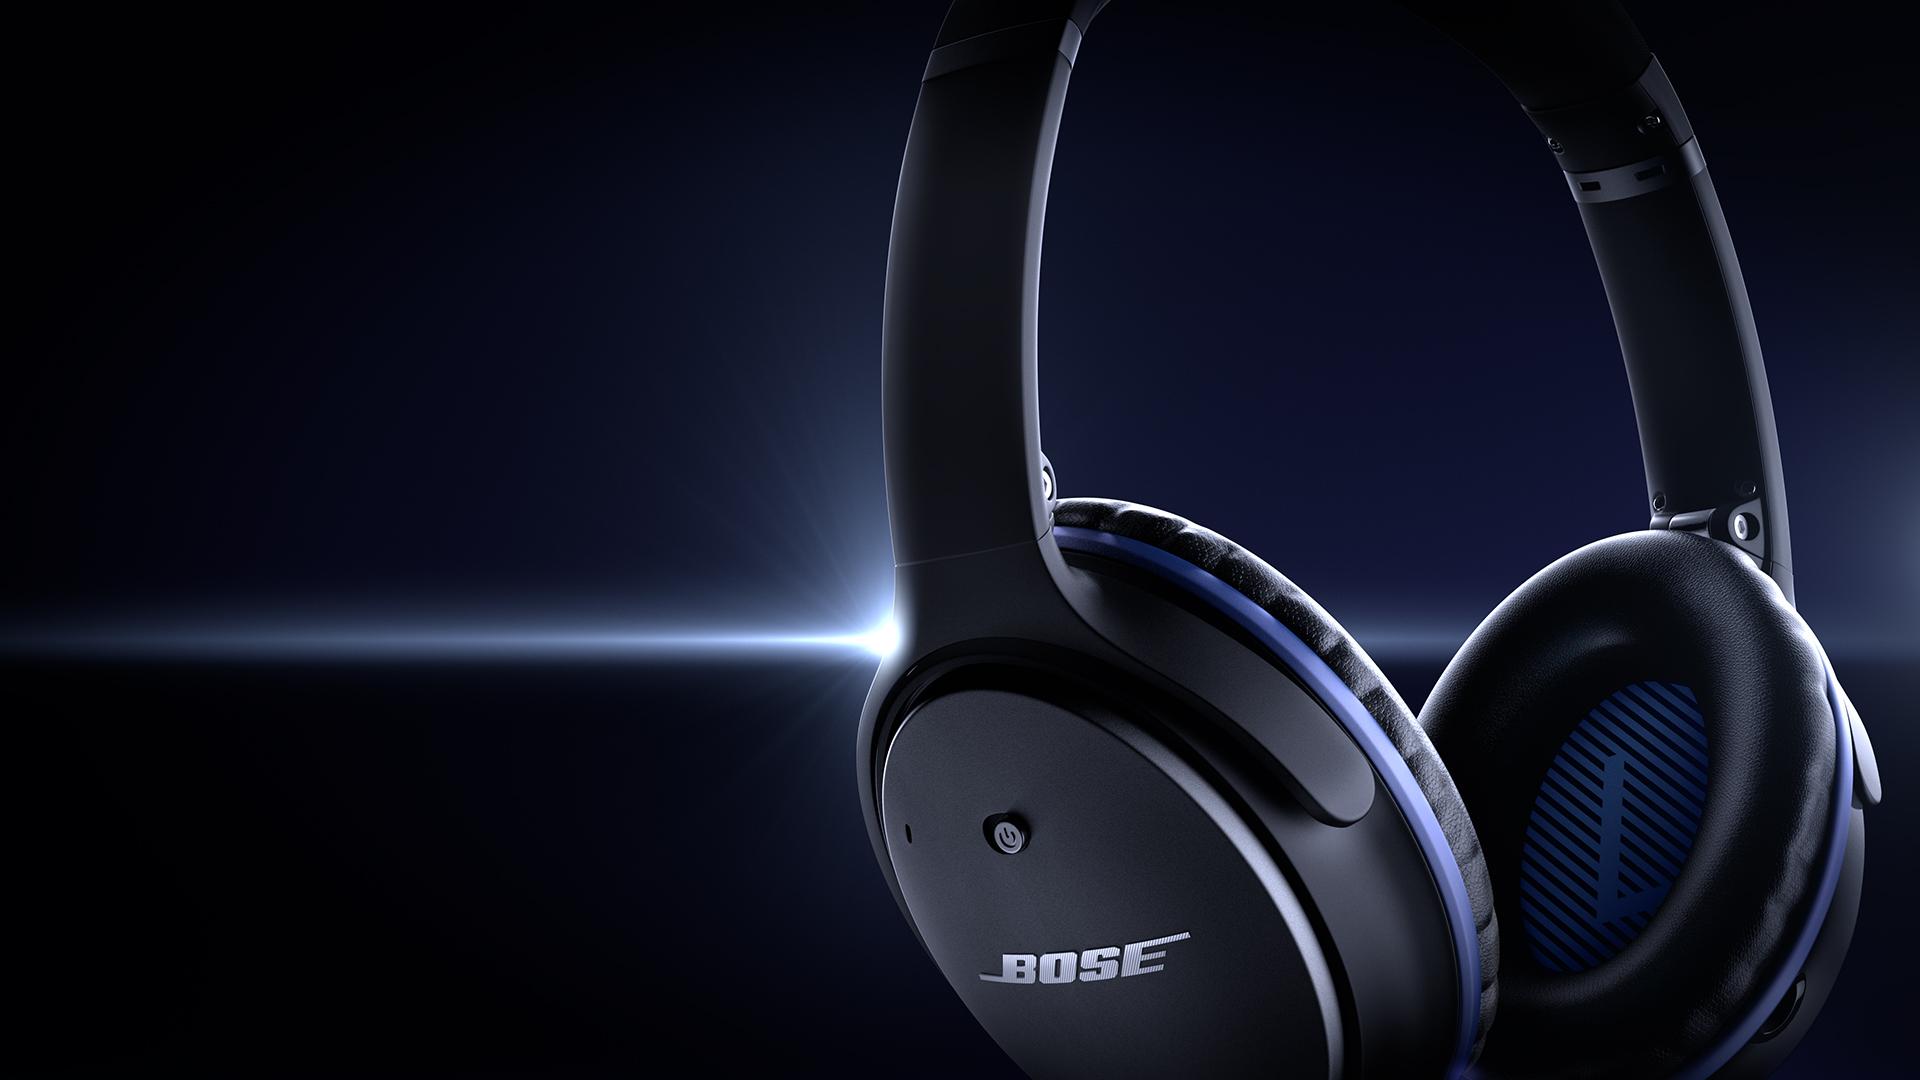 macroBose_sh04_headphones_FINAL.jpg